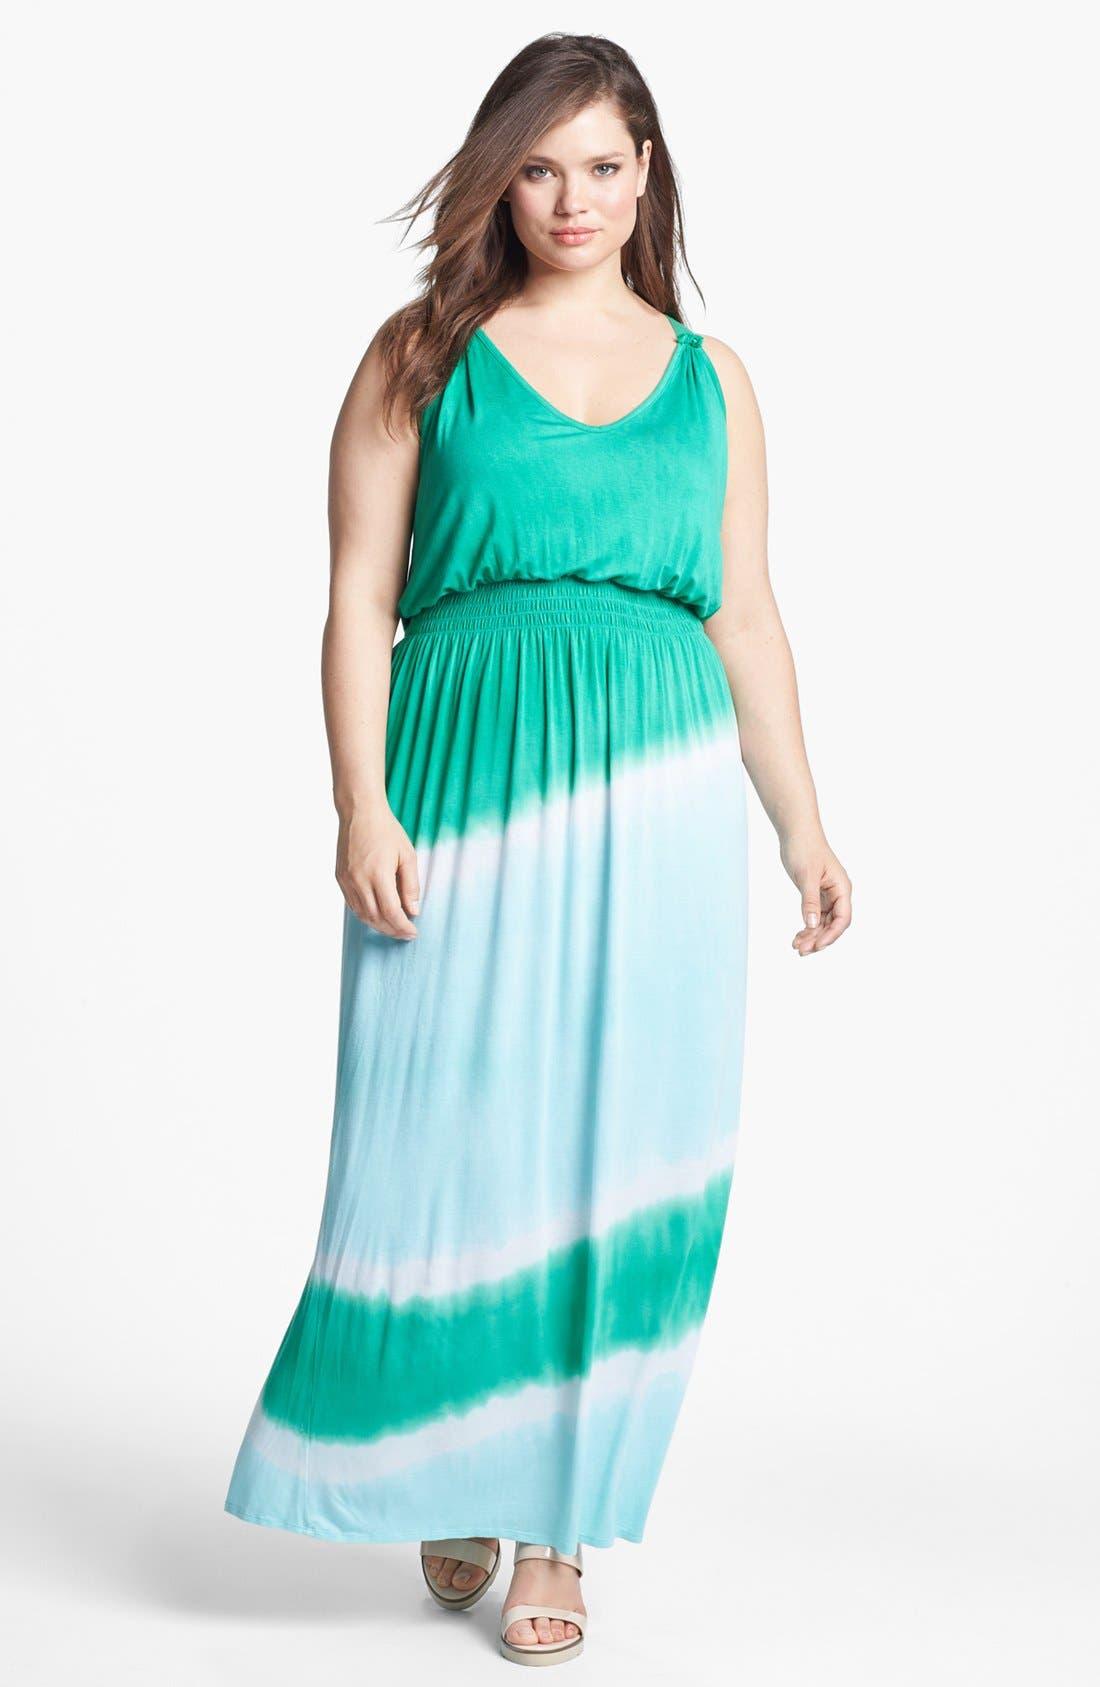 Main Image - Loveappella Tie Dye Maxi Dress (Plus Size)